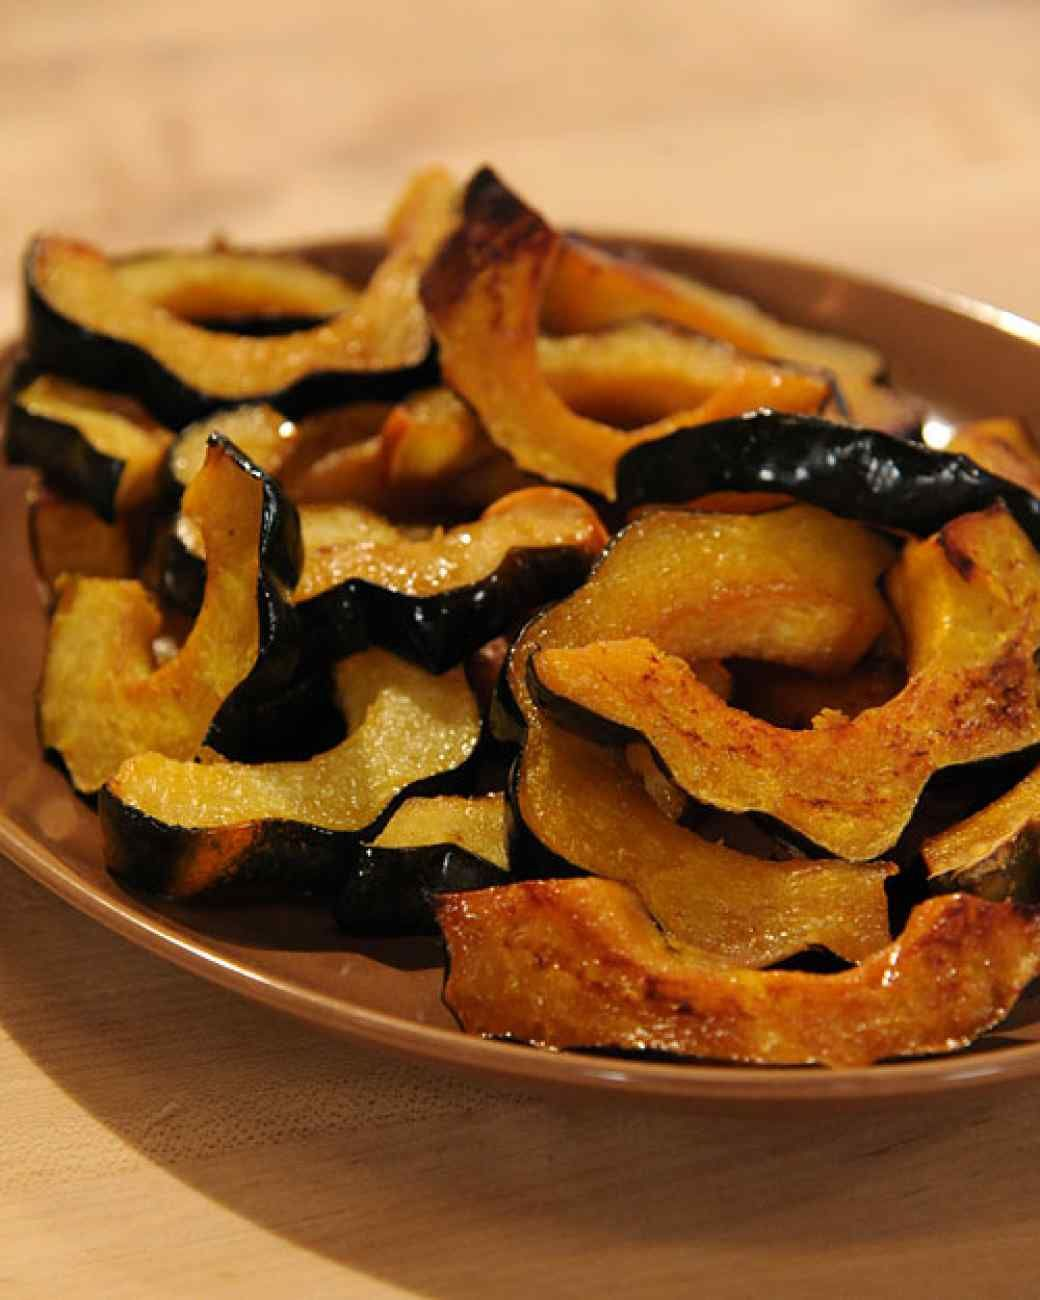 Vanilla And Cardamom Glazed Acorn Squash Rings Recipe With